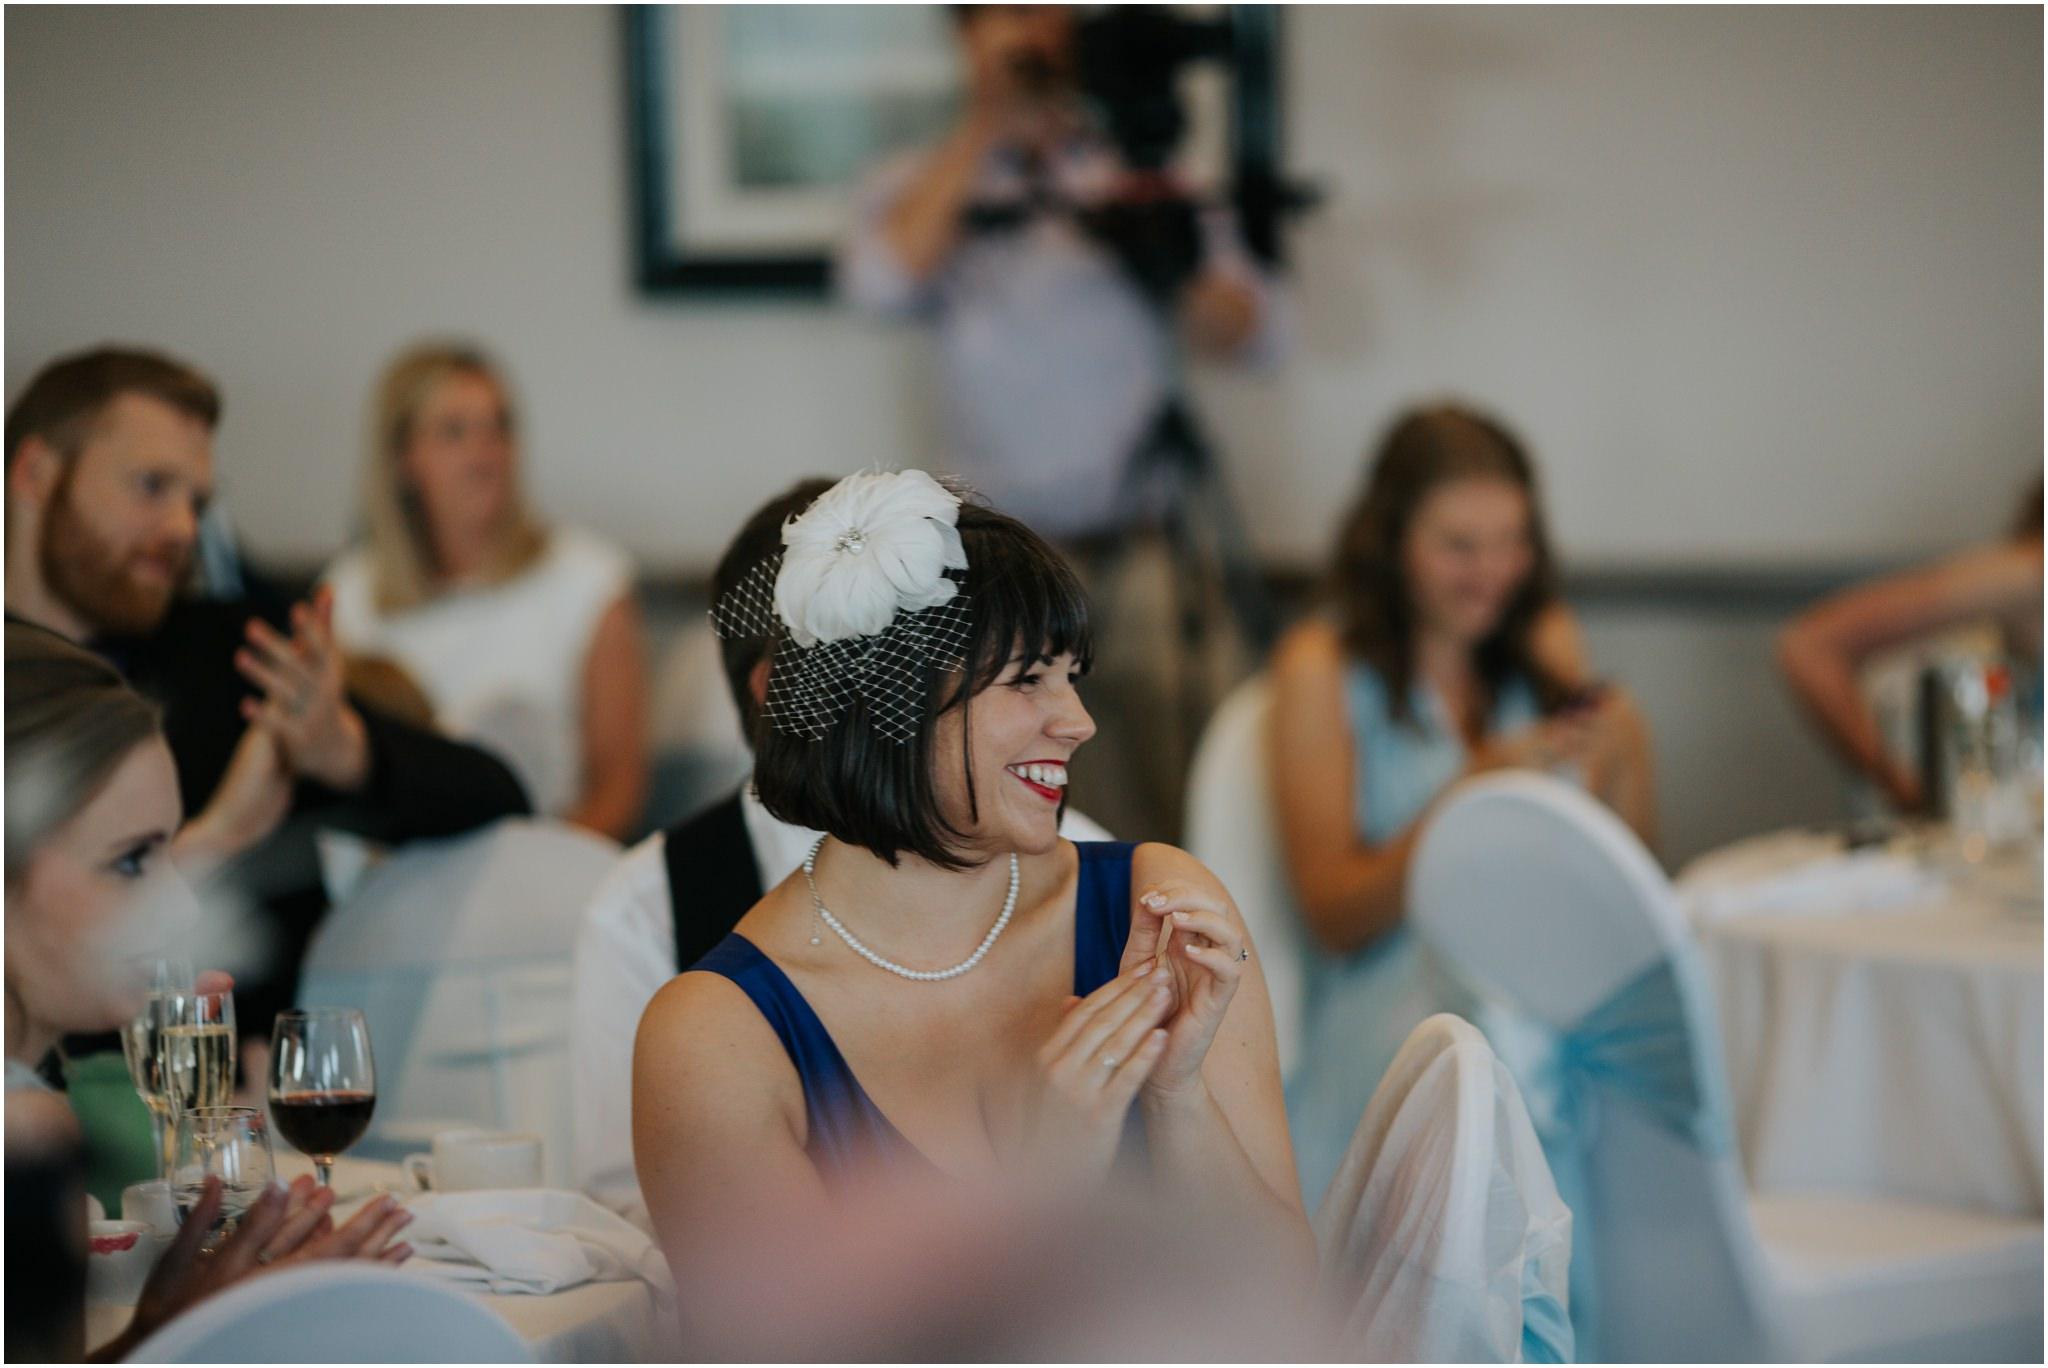 Photography 78 - Glasgow Wedding Photographer - Jordan & Abi - The Waterside Hotel, West Kilbride_0113.jpg